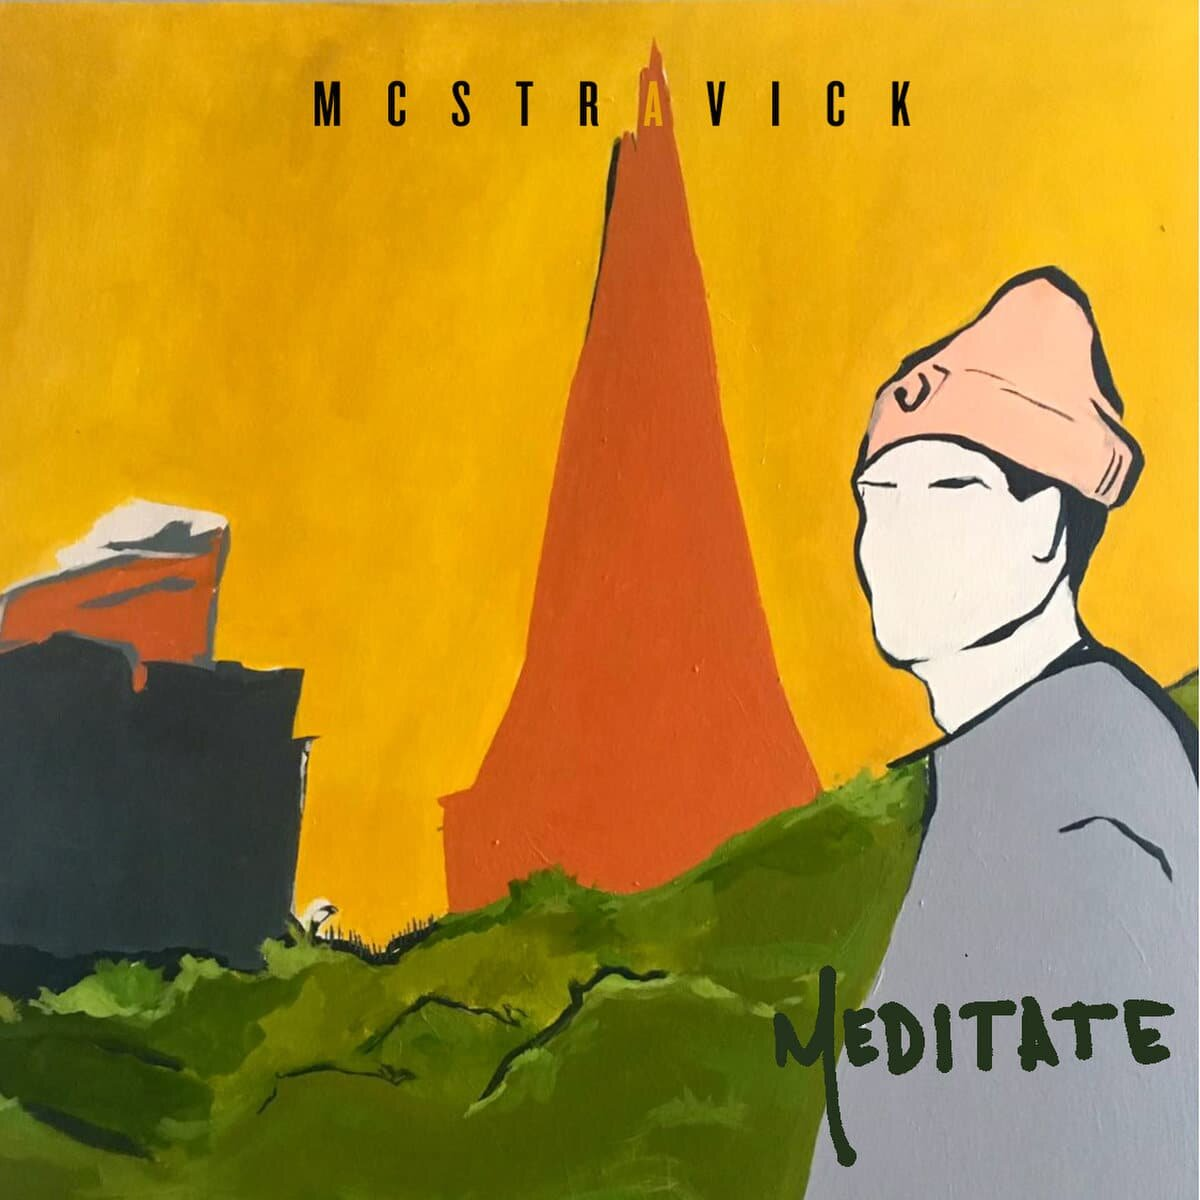 Mcstravick - Meditate (Old Soul Kollective & 330 Basement Music)